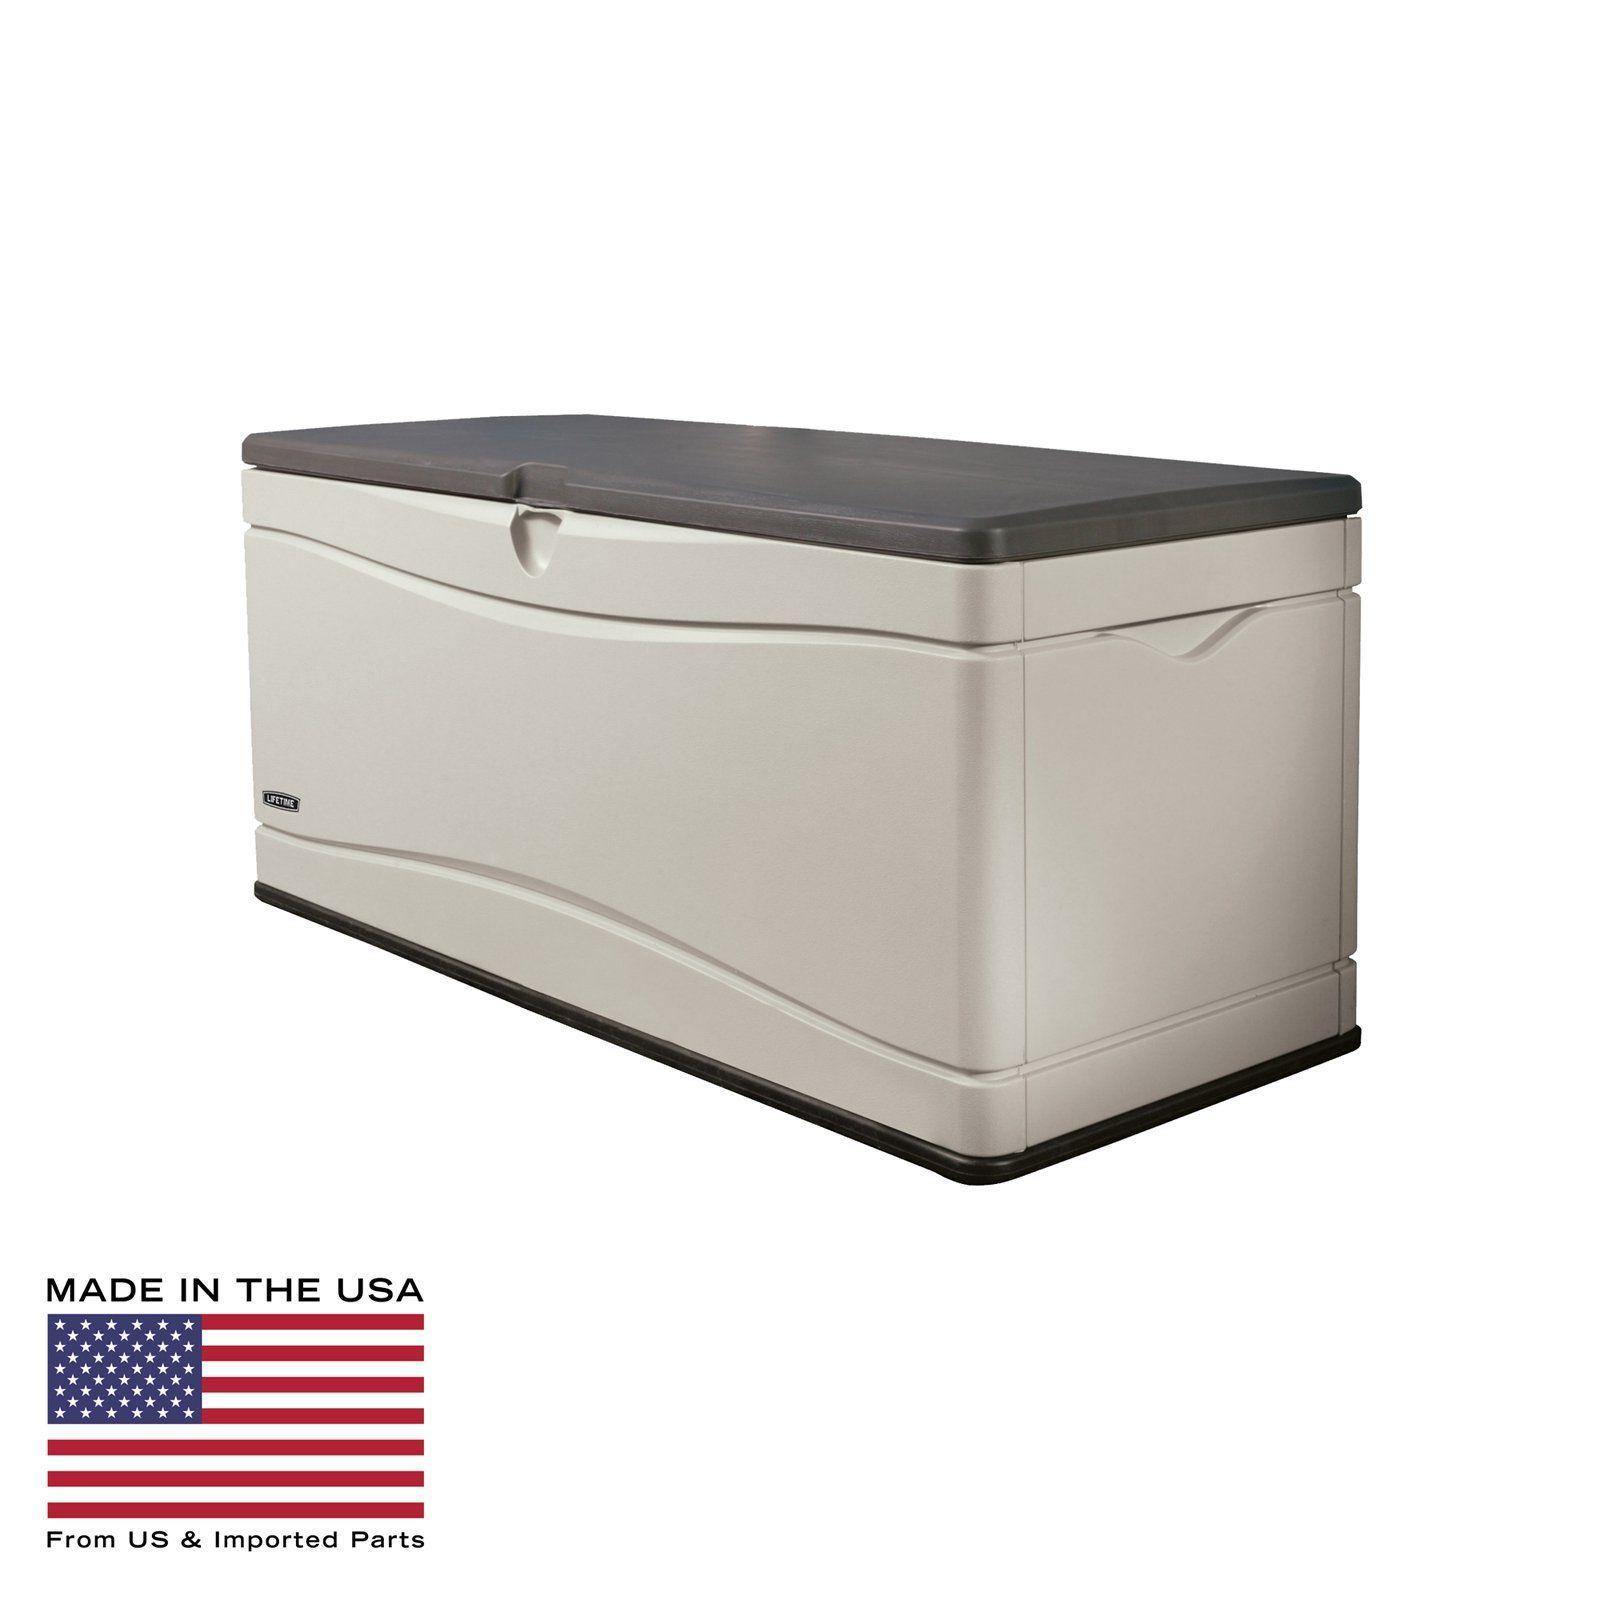 Lifetime 130 Gallon Large Outdoor Storage Box Outdoor Deck Box